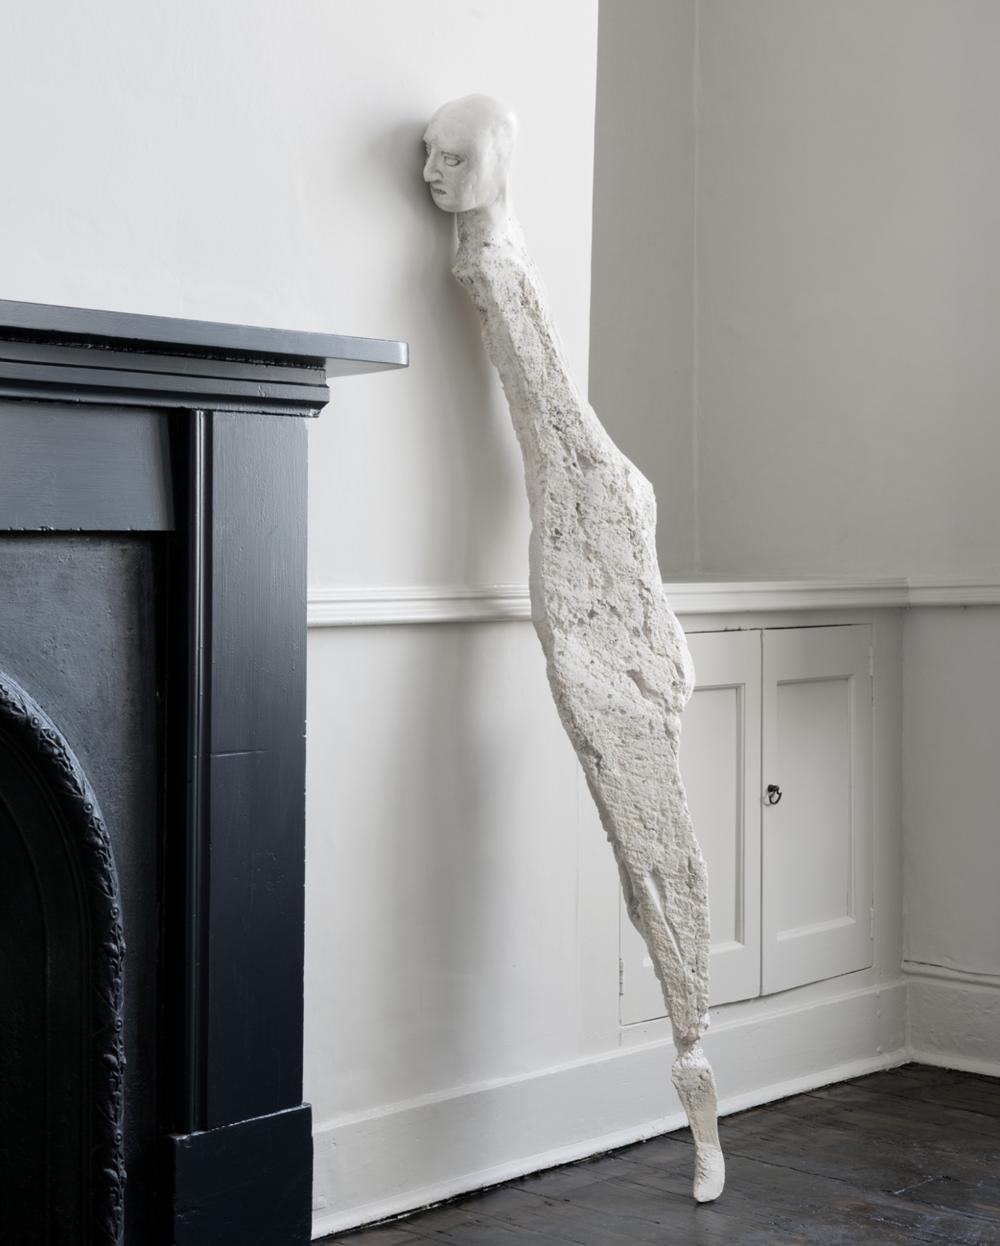 Enrico David Untitled, 2015 Jesmonite, steel and graphite 158 x 27 x 15 cm